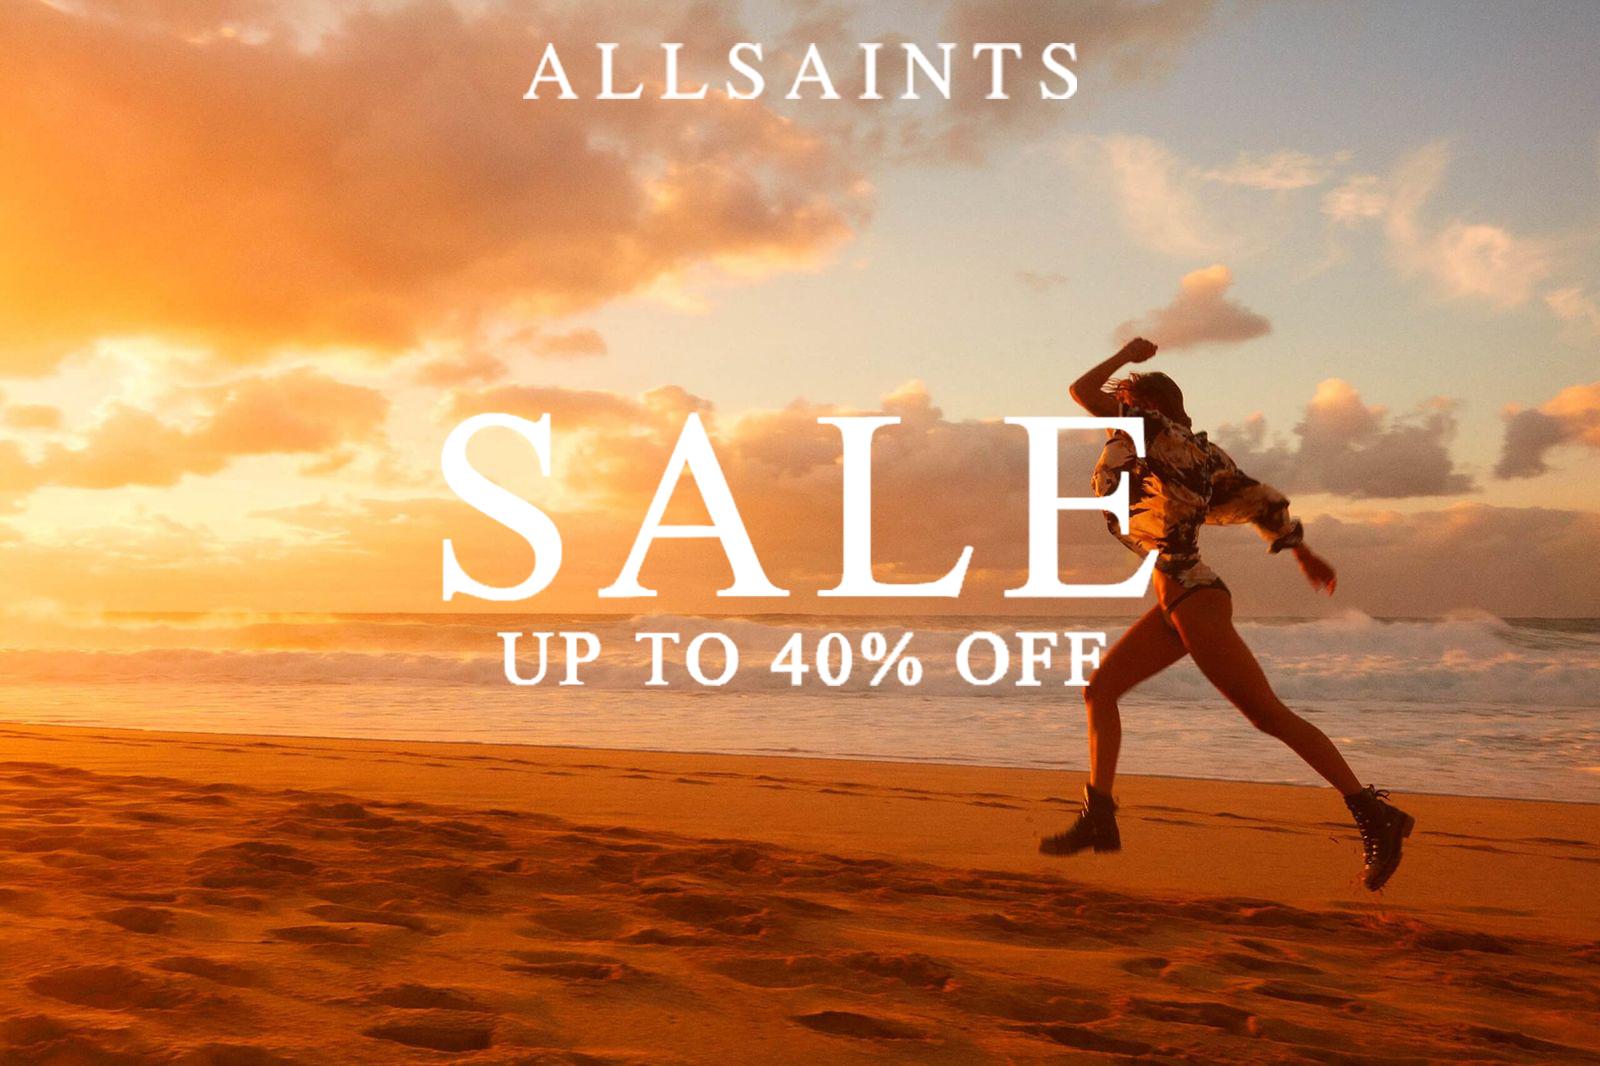 AllSaints | 夏季折扣高达40%OFF,经典皮衣和夏日碎花都有!